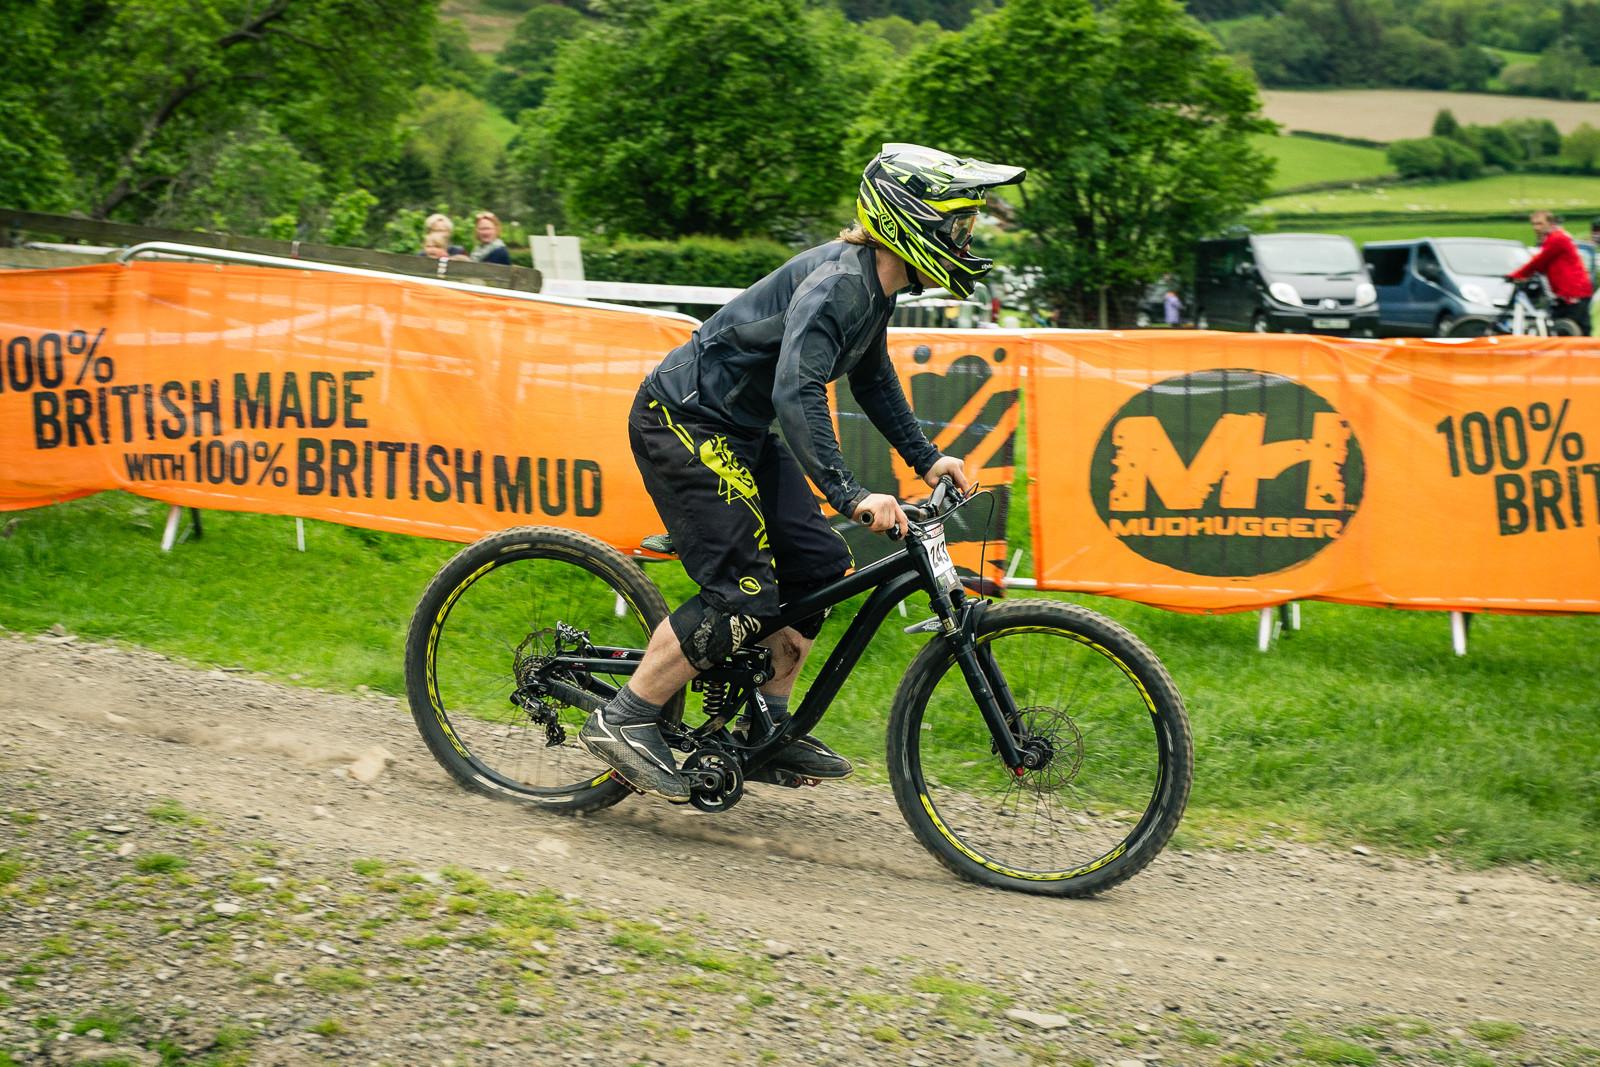 G Out at Llangollen - G-Out Project - Llangollen BDS 2015 - Mountain Biking Pictures - Vital MTB